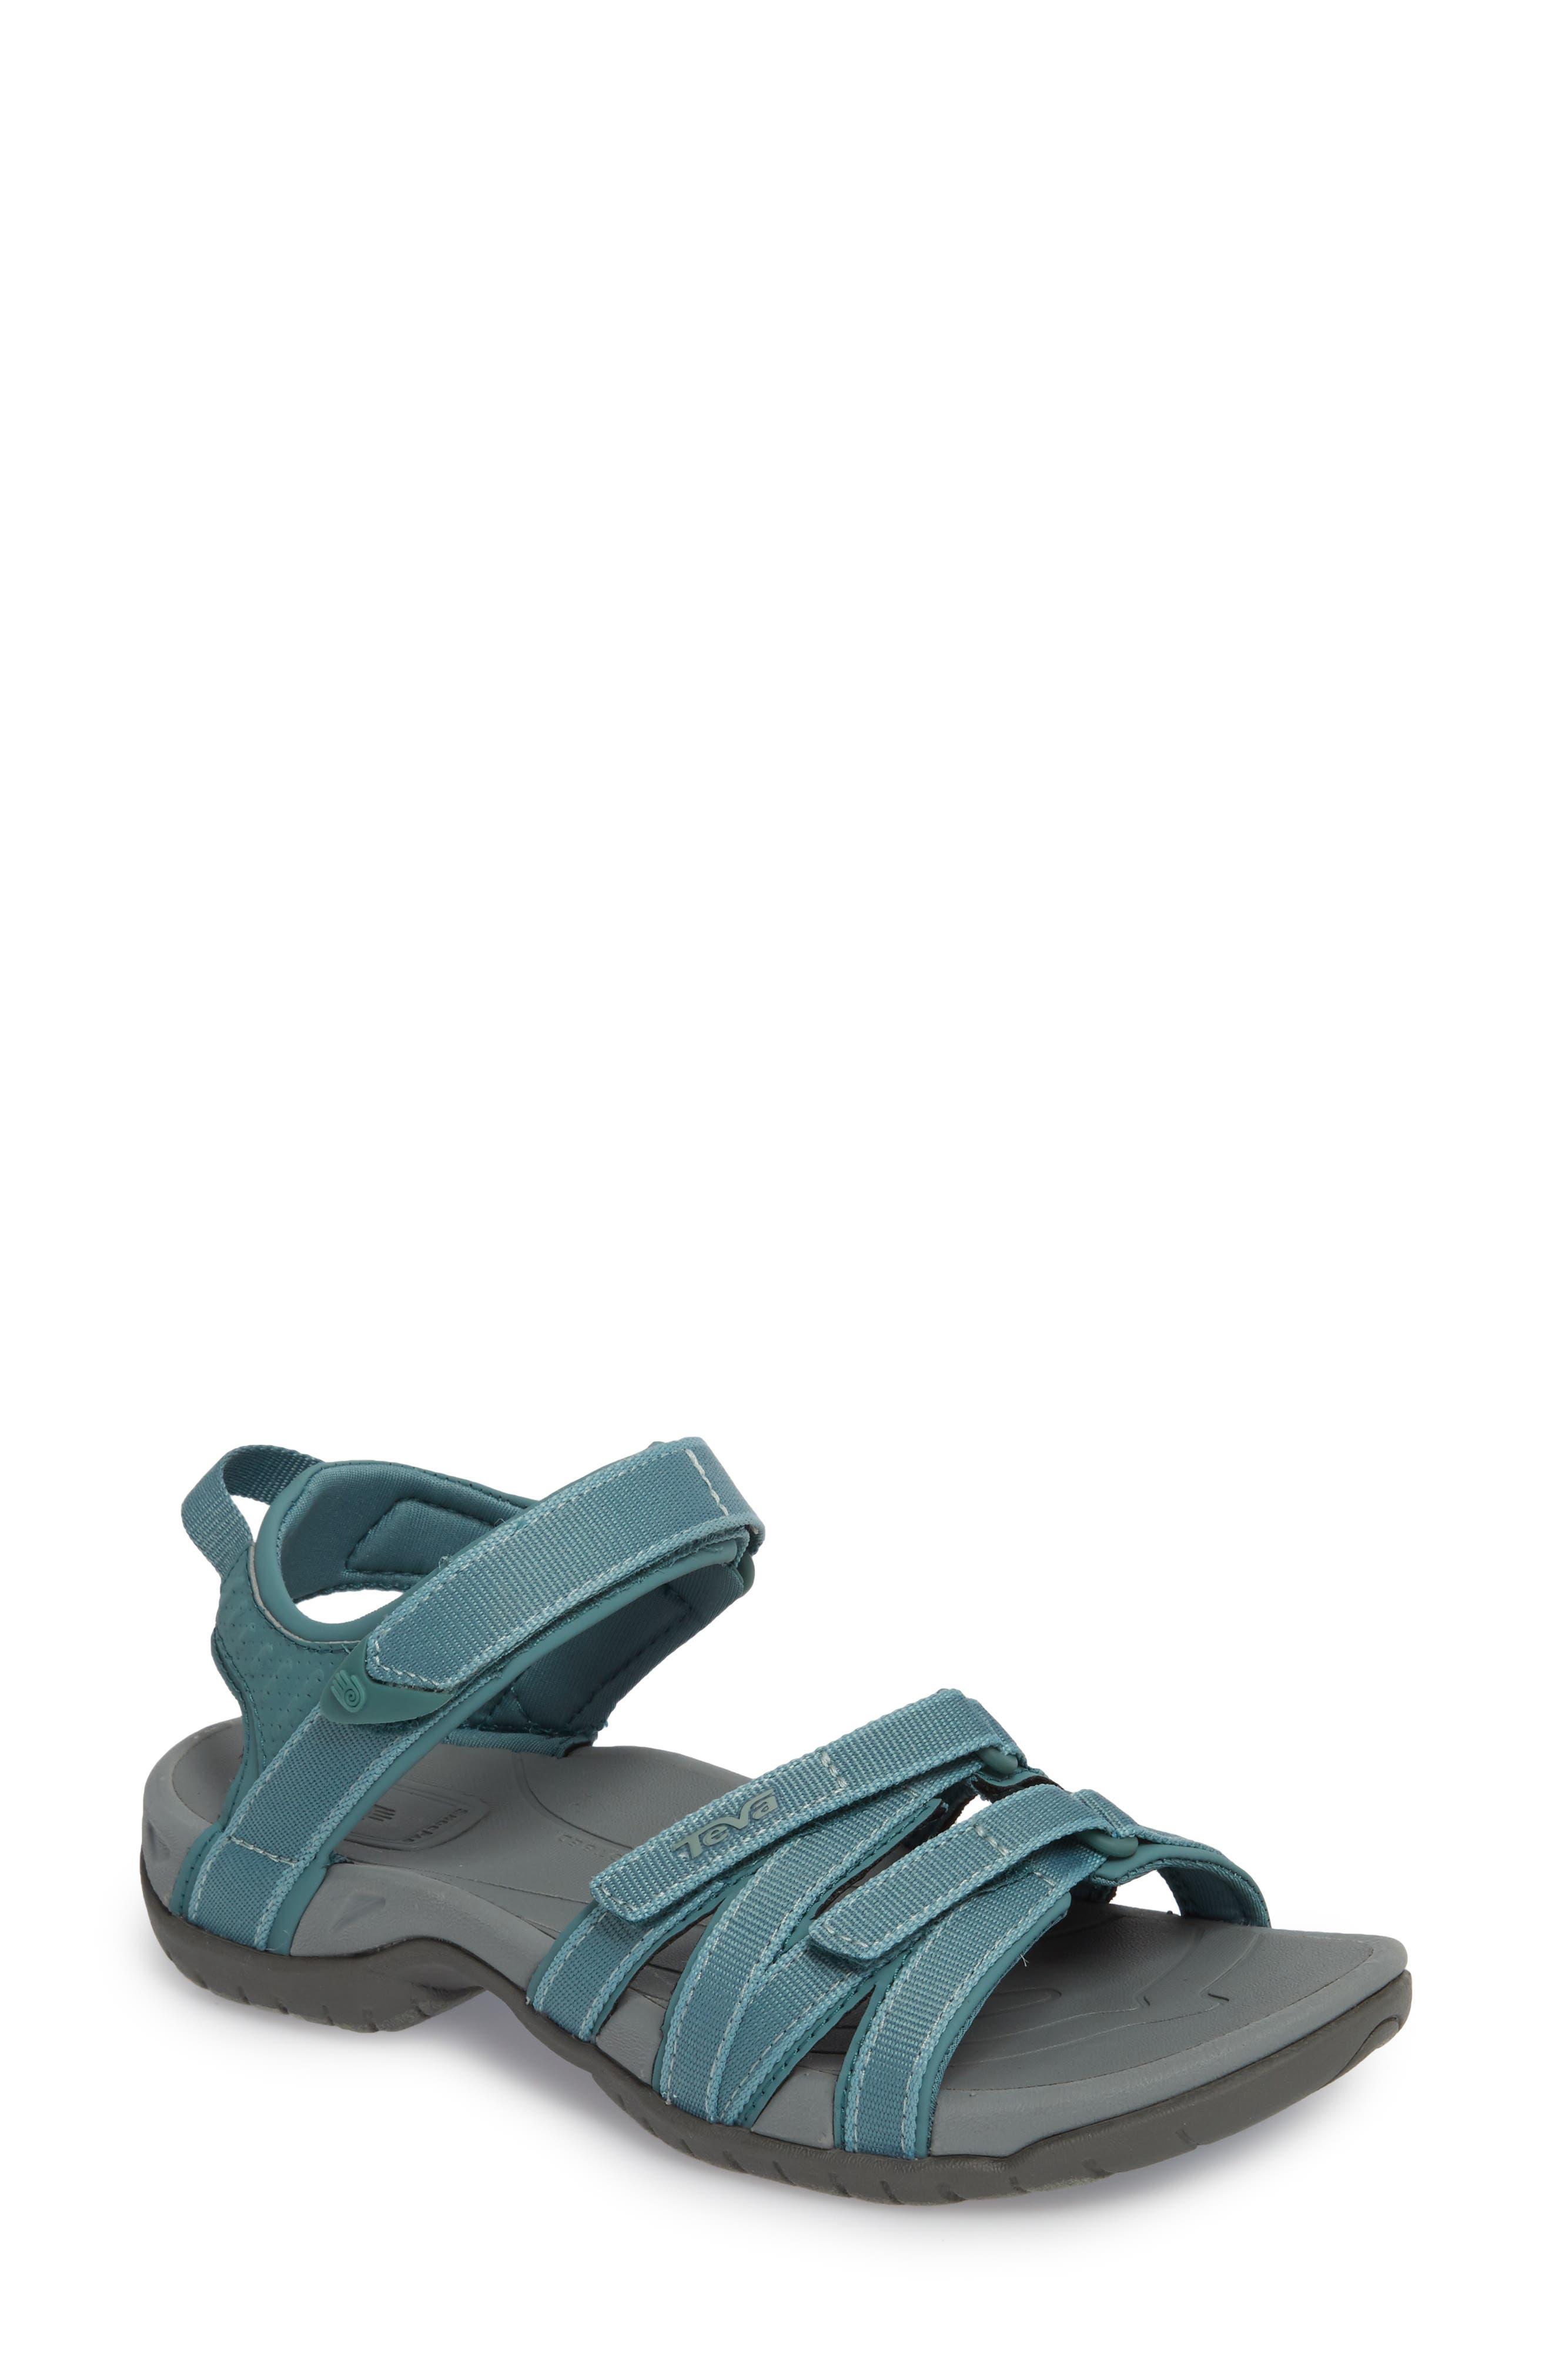 'Tirra' Sandal,                             Main thumbnail 1, color,                             North Atlantic